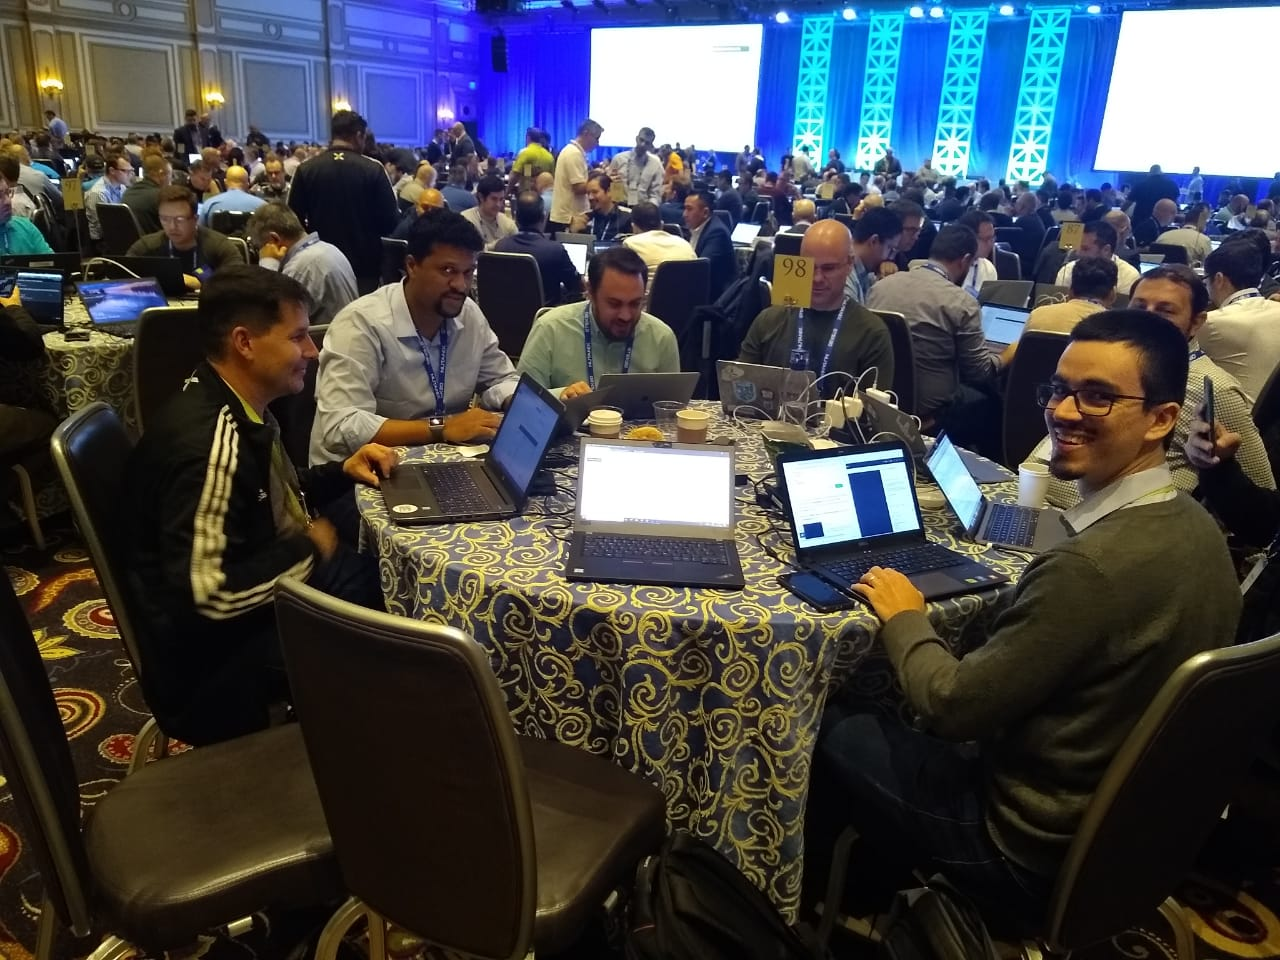 Servix participa do Nutanix Global Tech Summit